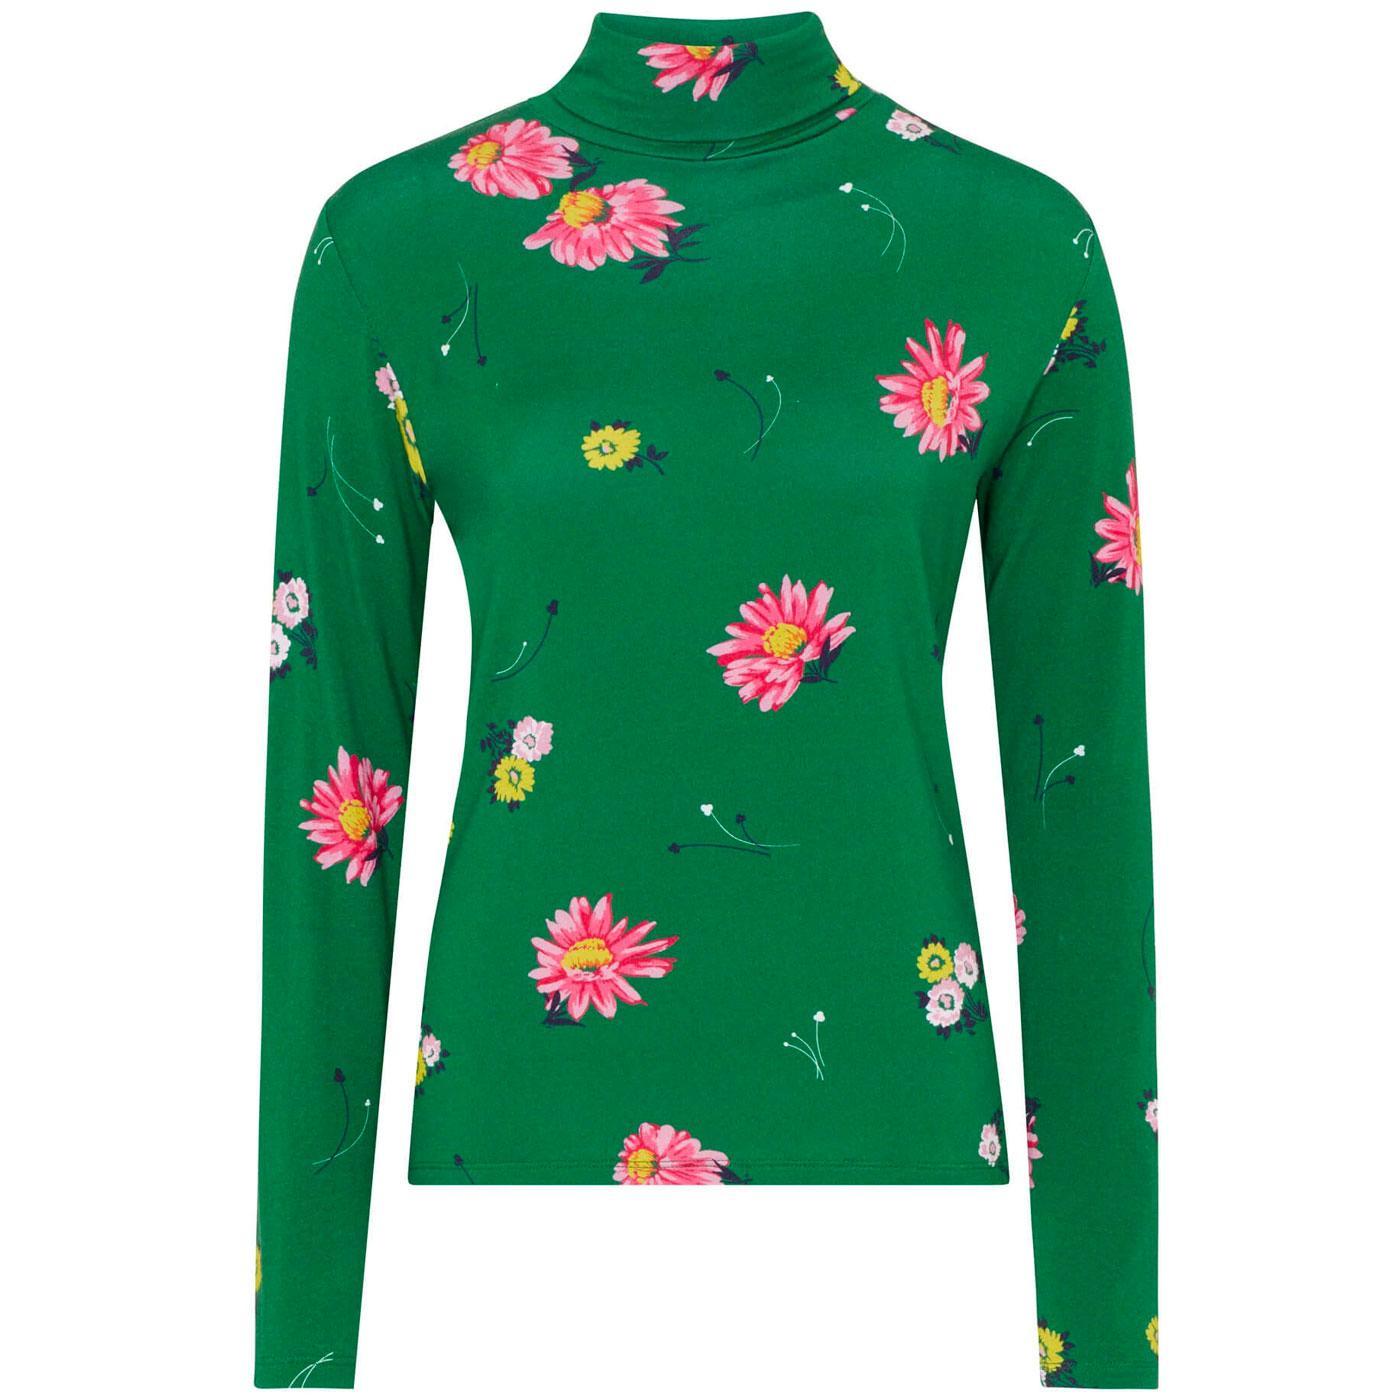 Alma EMILY & FIN Vintage 60s Floral Rollneck Top